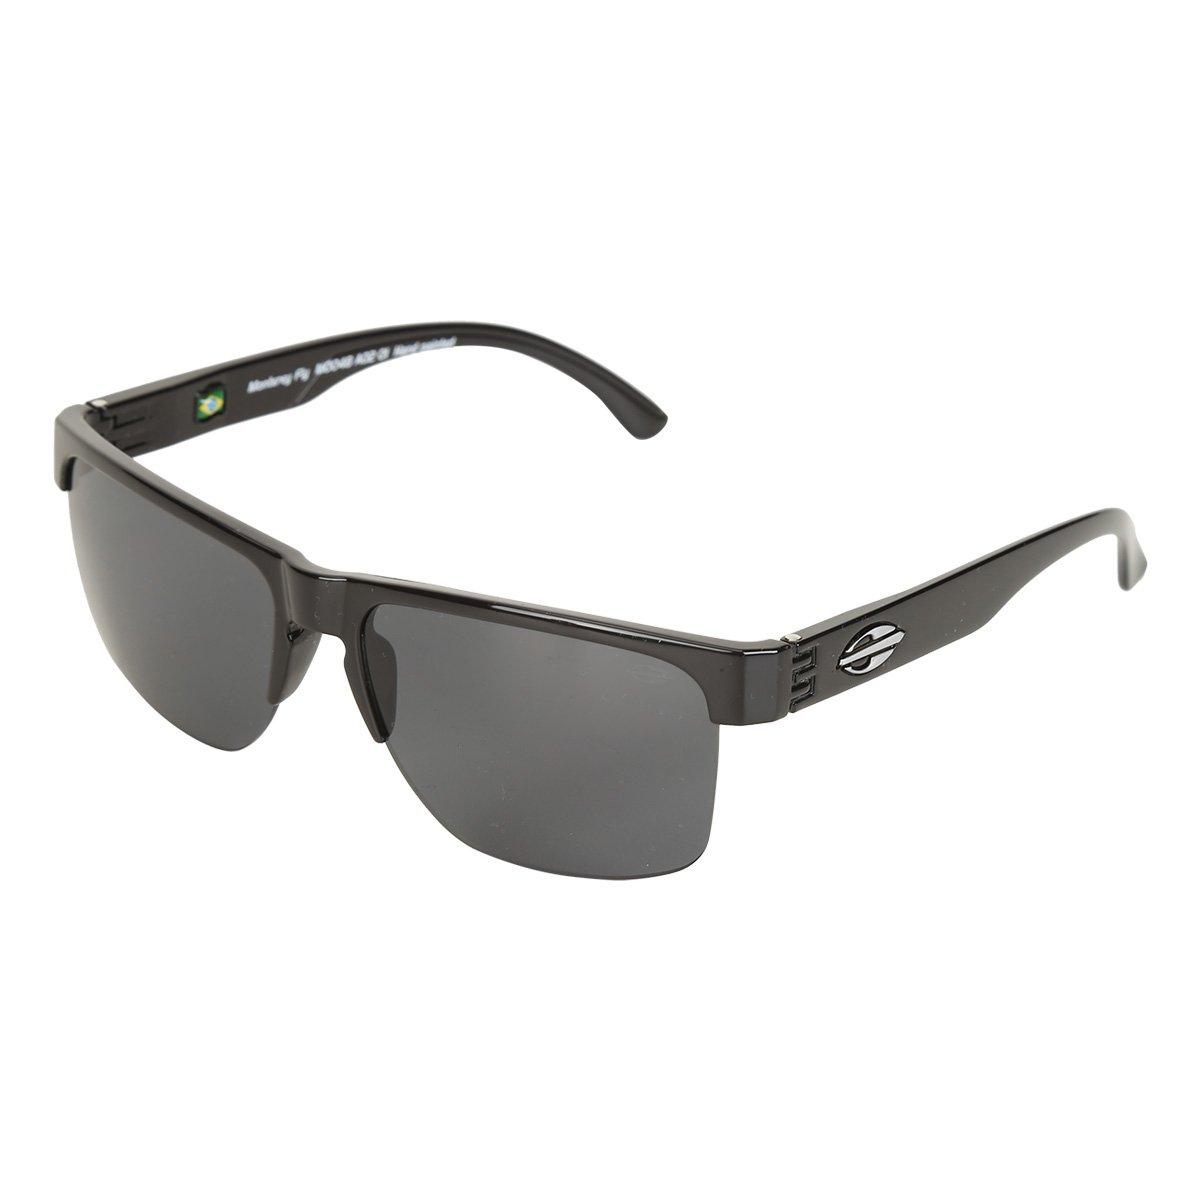 1ffd6289e ... 74ffe36e5b5bf Óculos de Sol Mormaii Monterey Fly Brilho Masculino -  Compre Agora .